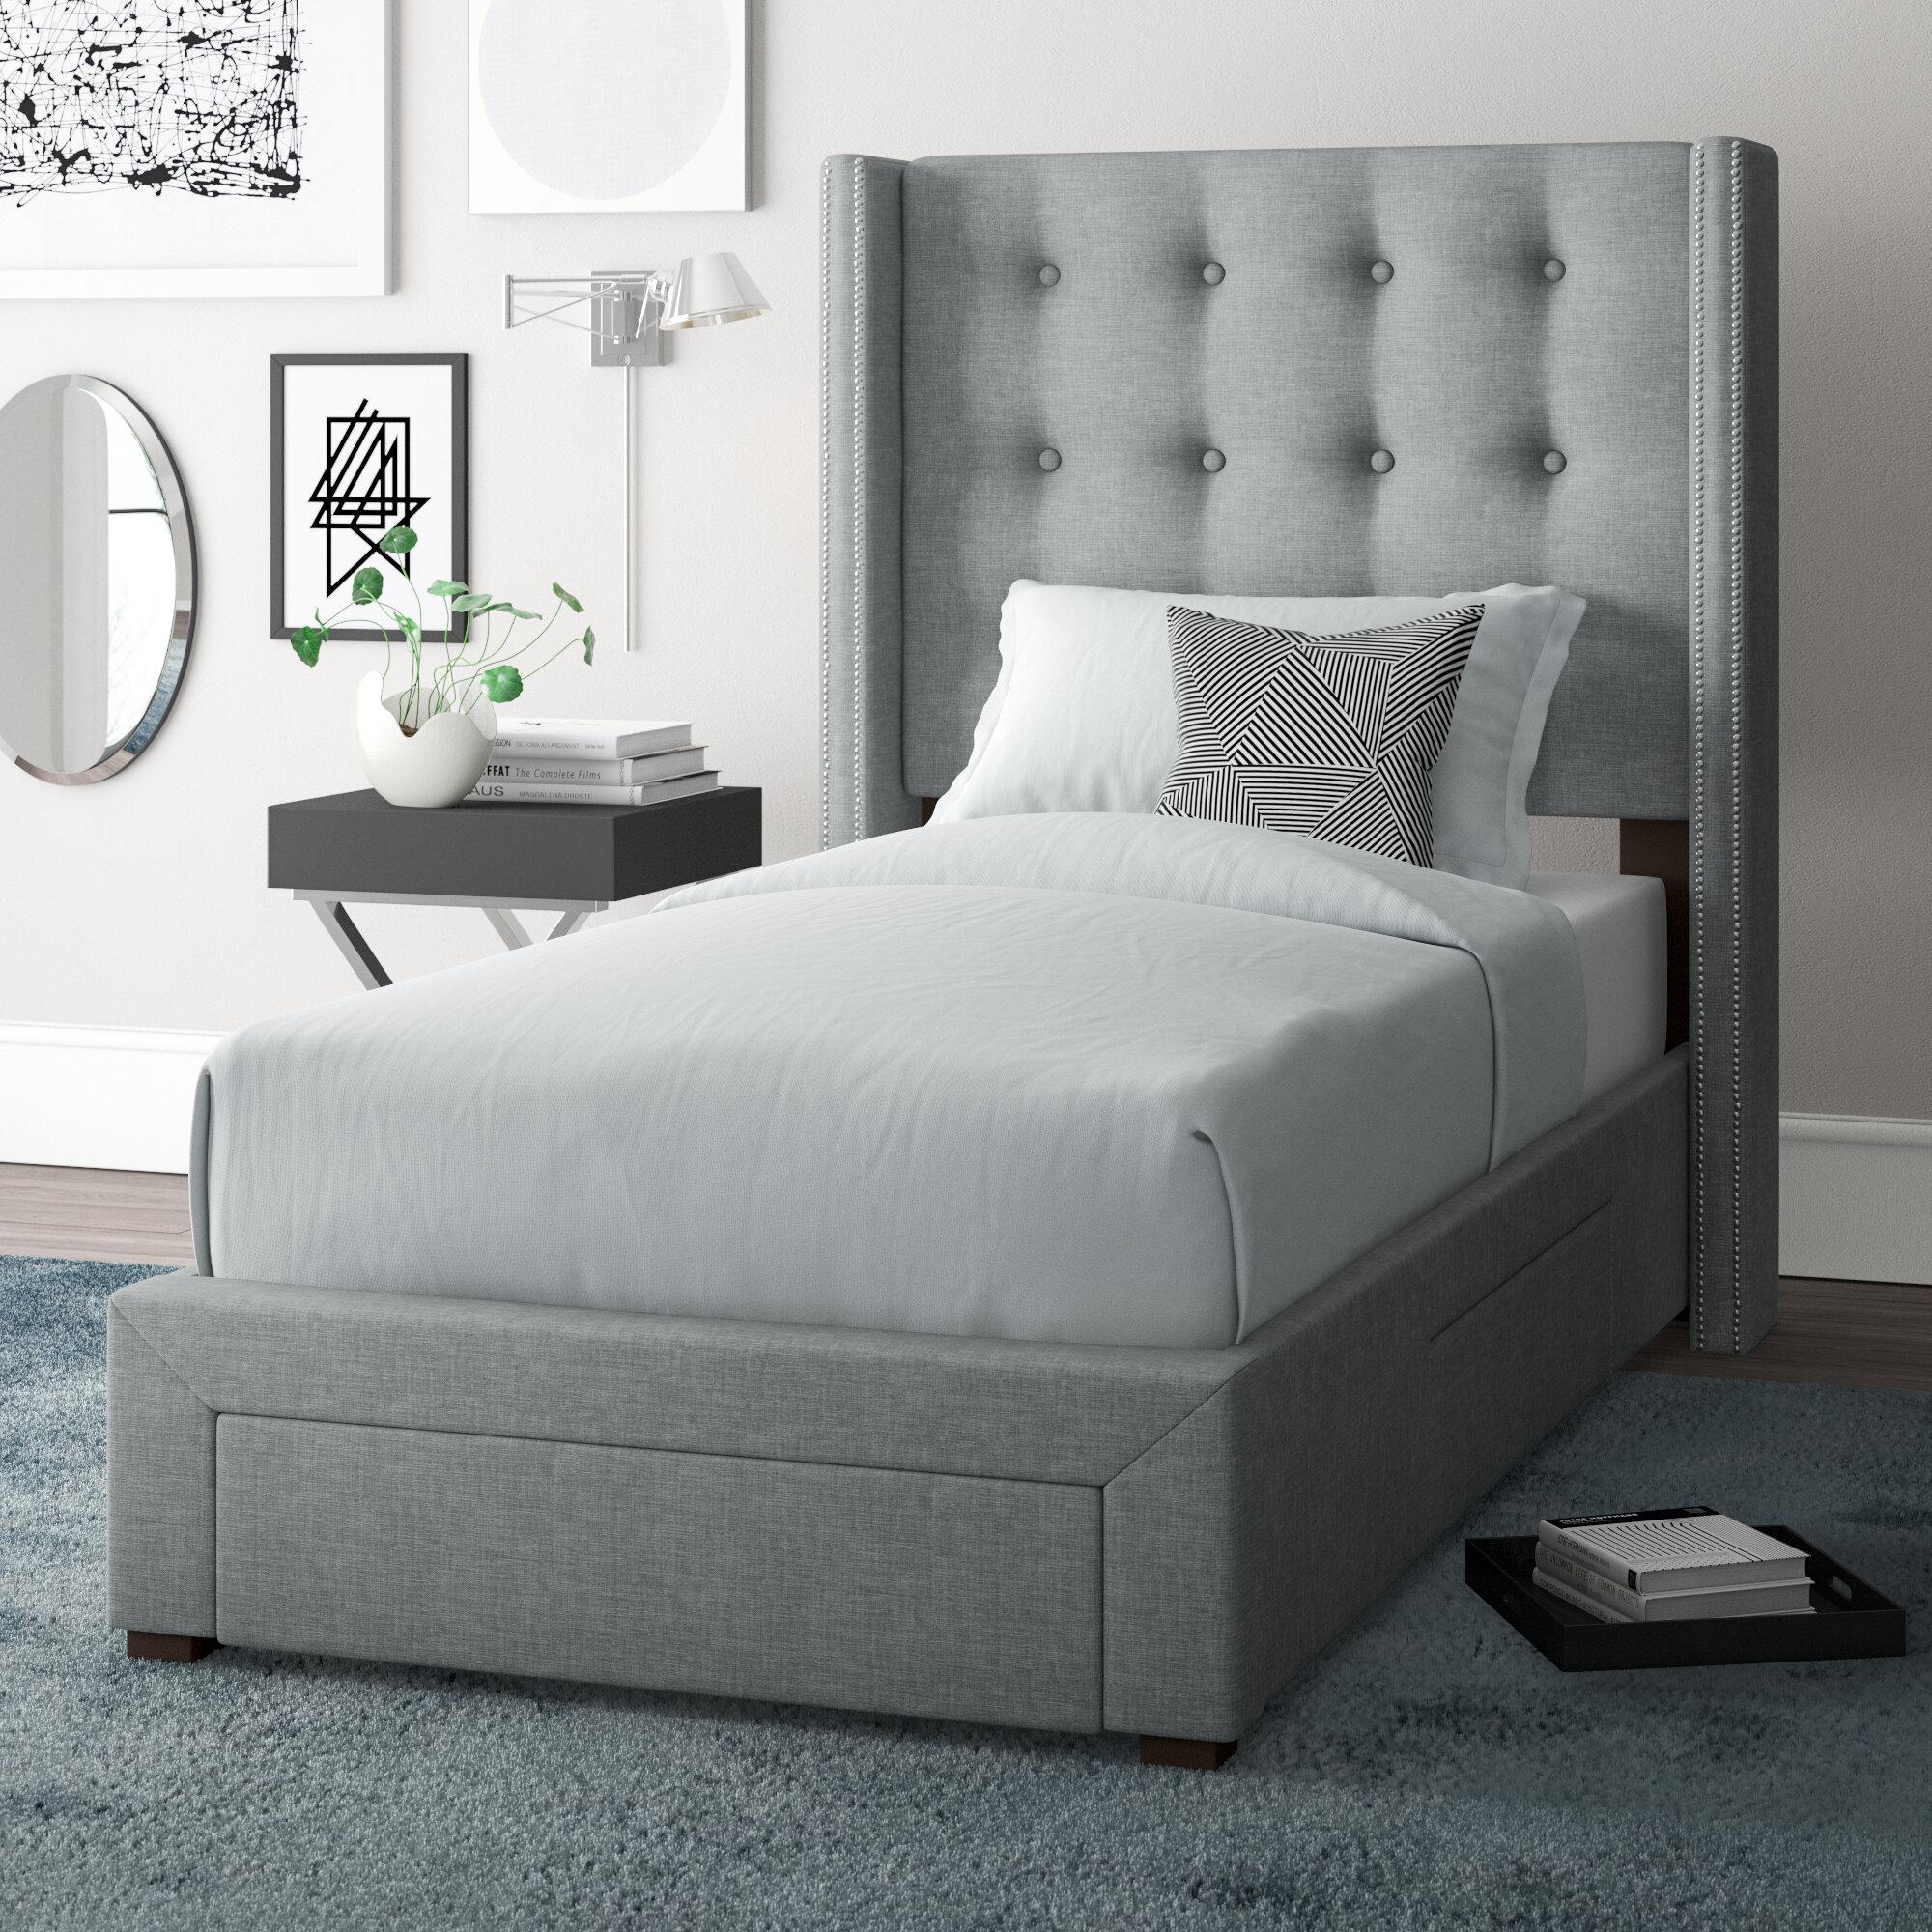 Kerens Twin Upholstered Storage Standard Bed